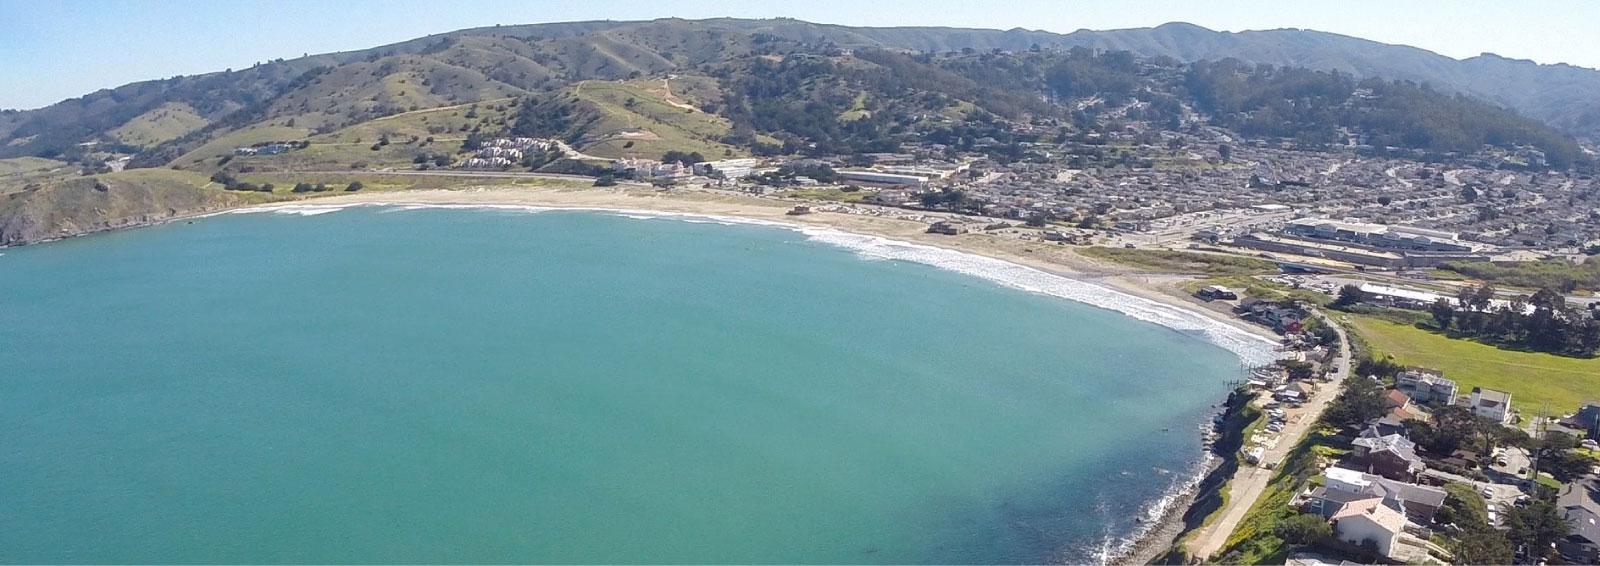 action plan header, coast line Half Moon Bay photo